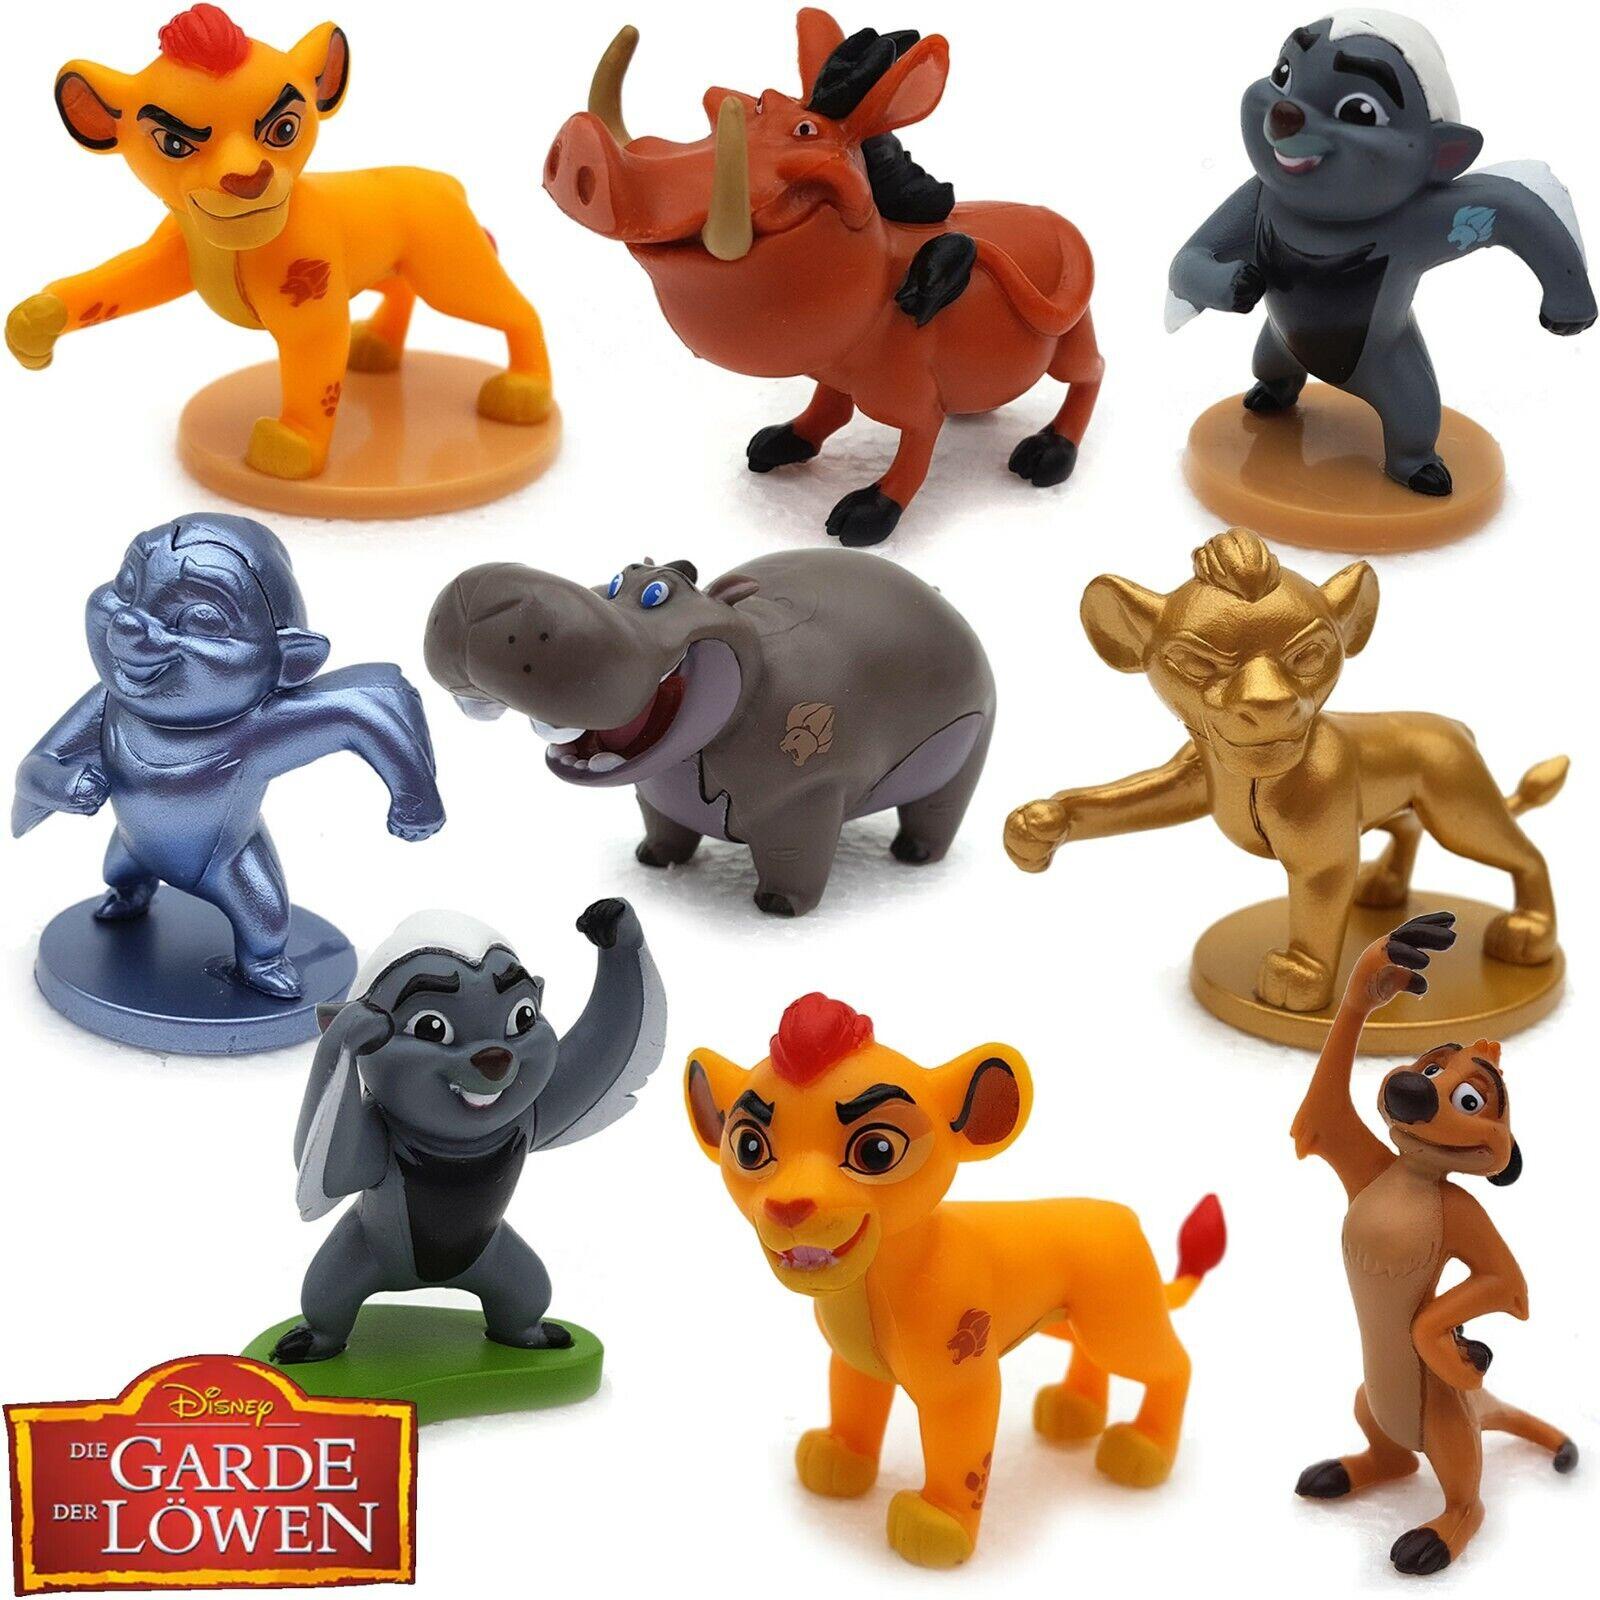 Sammelfiguren König der Löwen Figur Simba Lion Garde Guard Kion Bunga ab 3,90 €